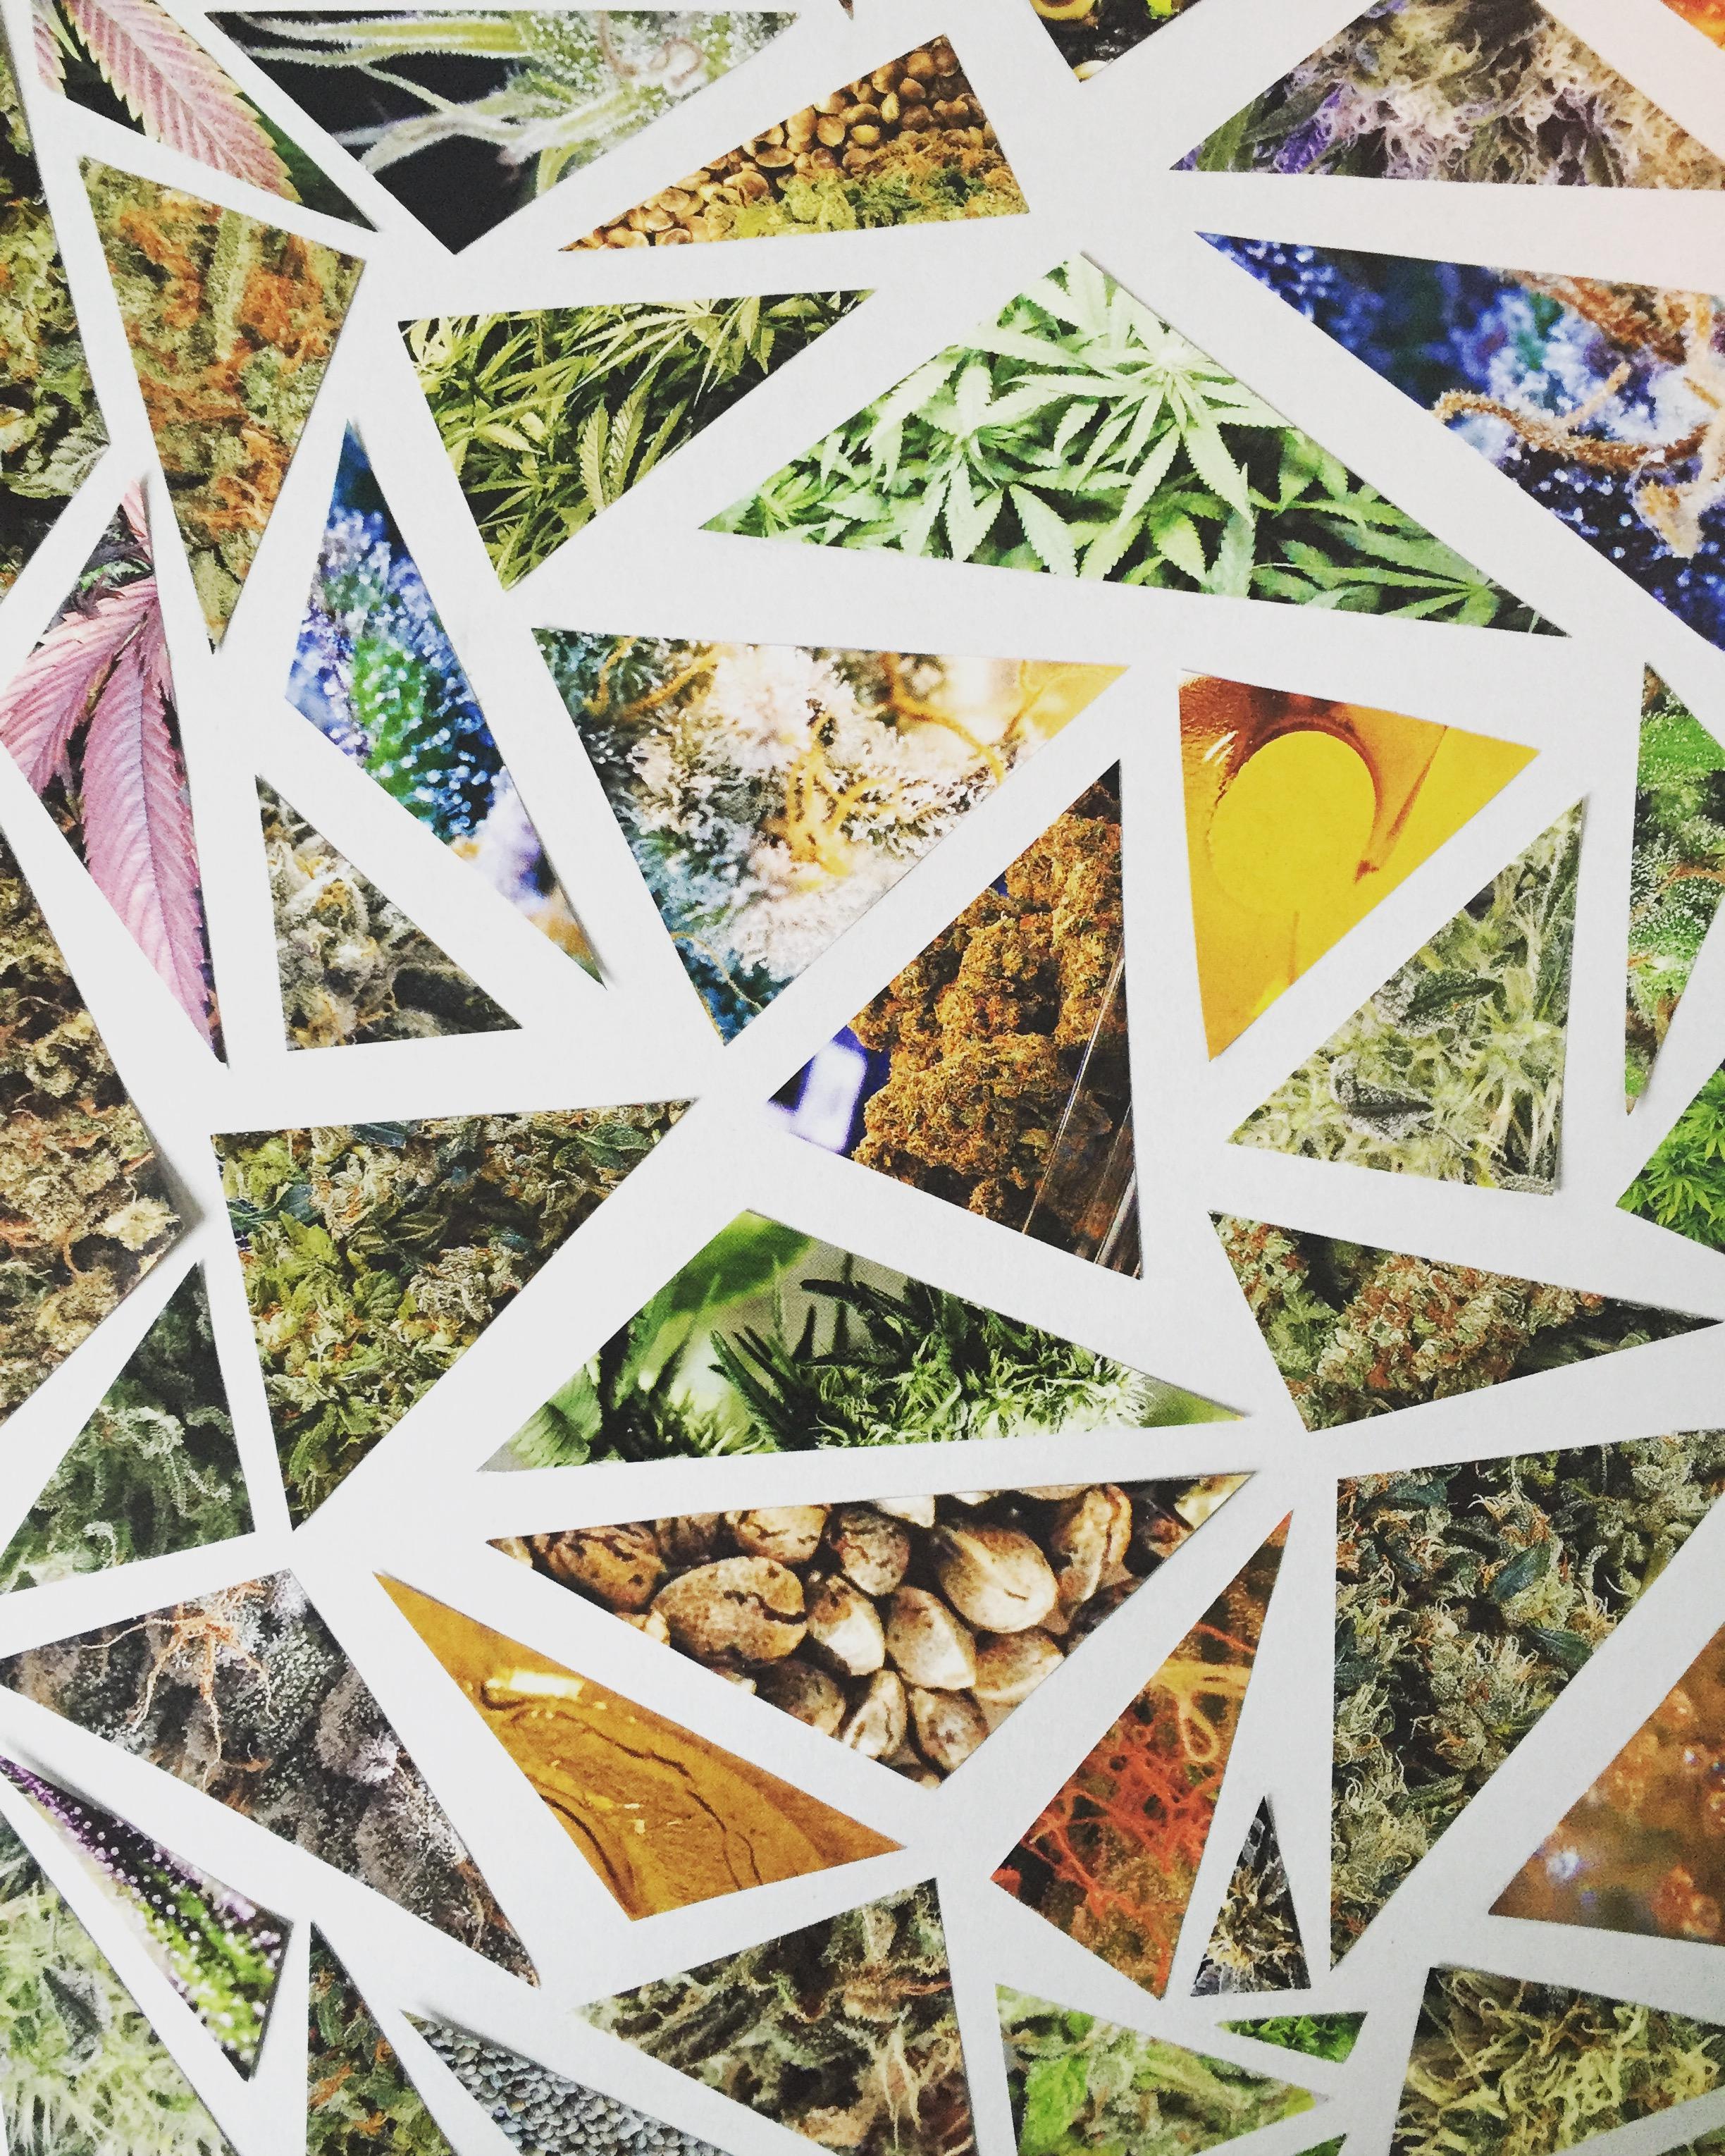 high times magazine cannabis collage